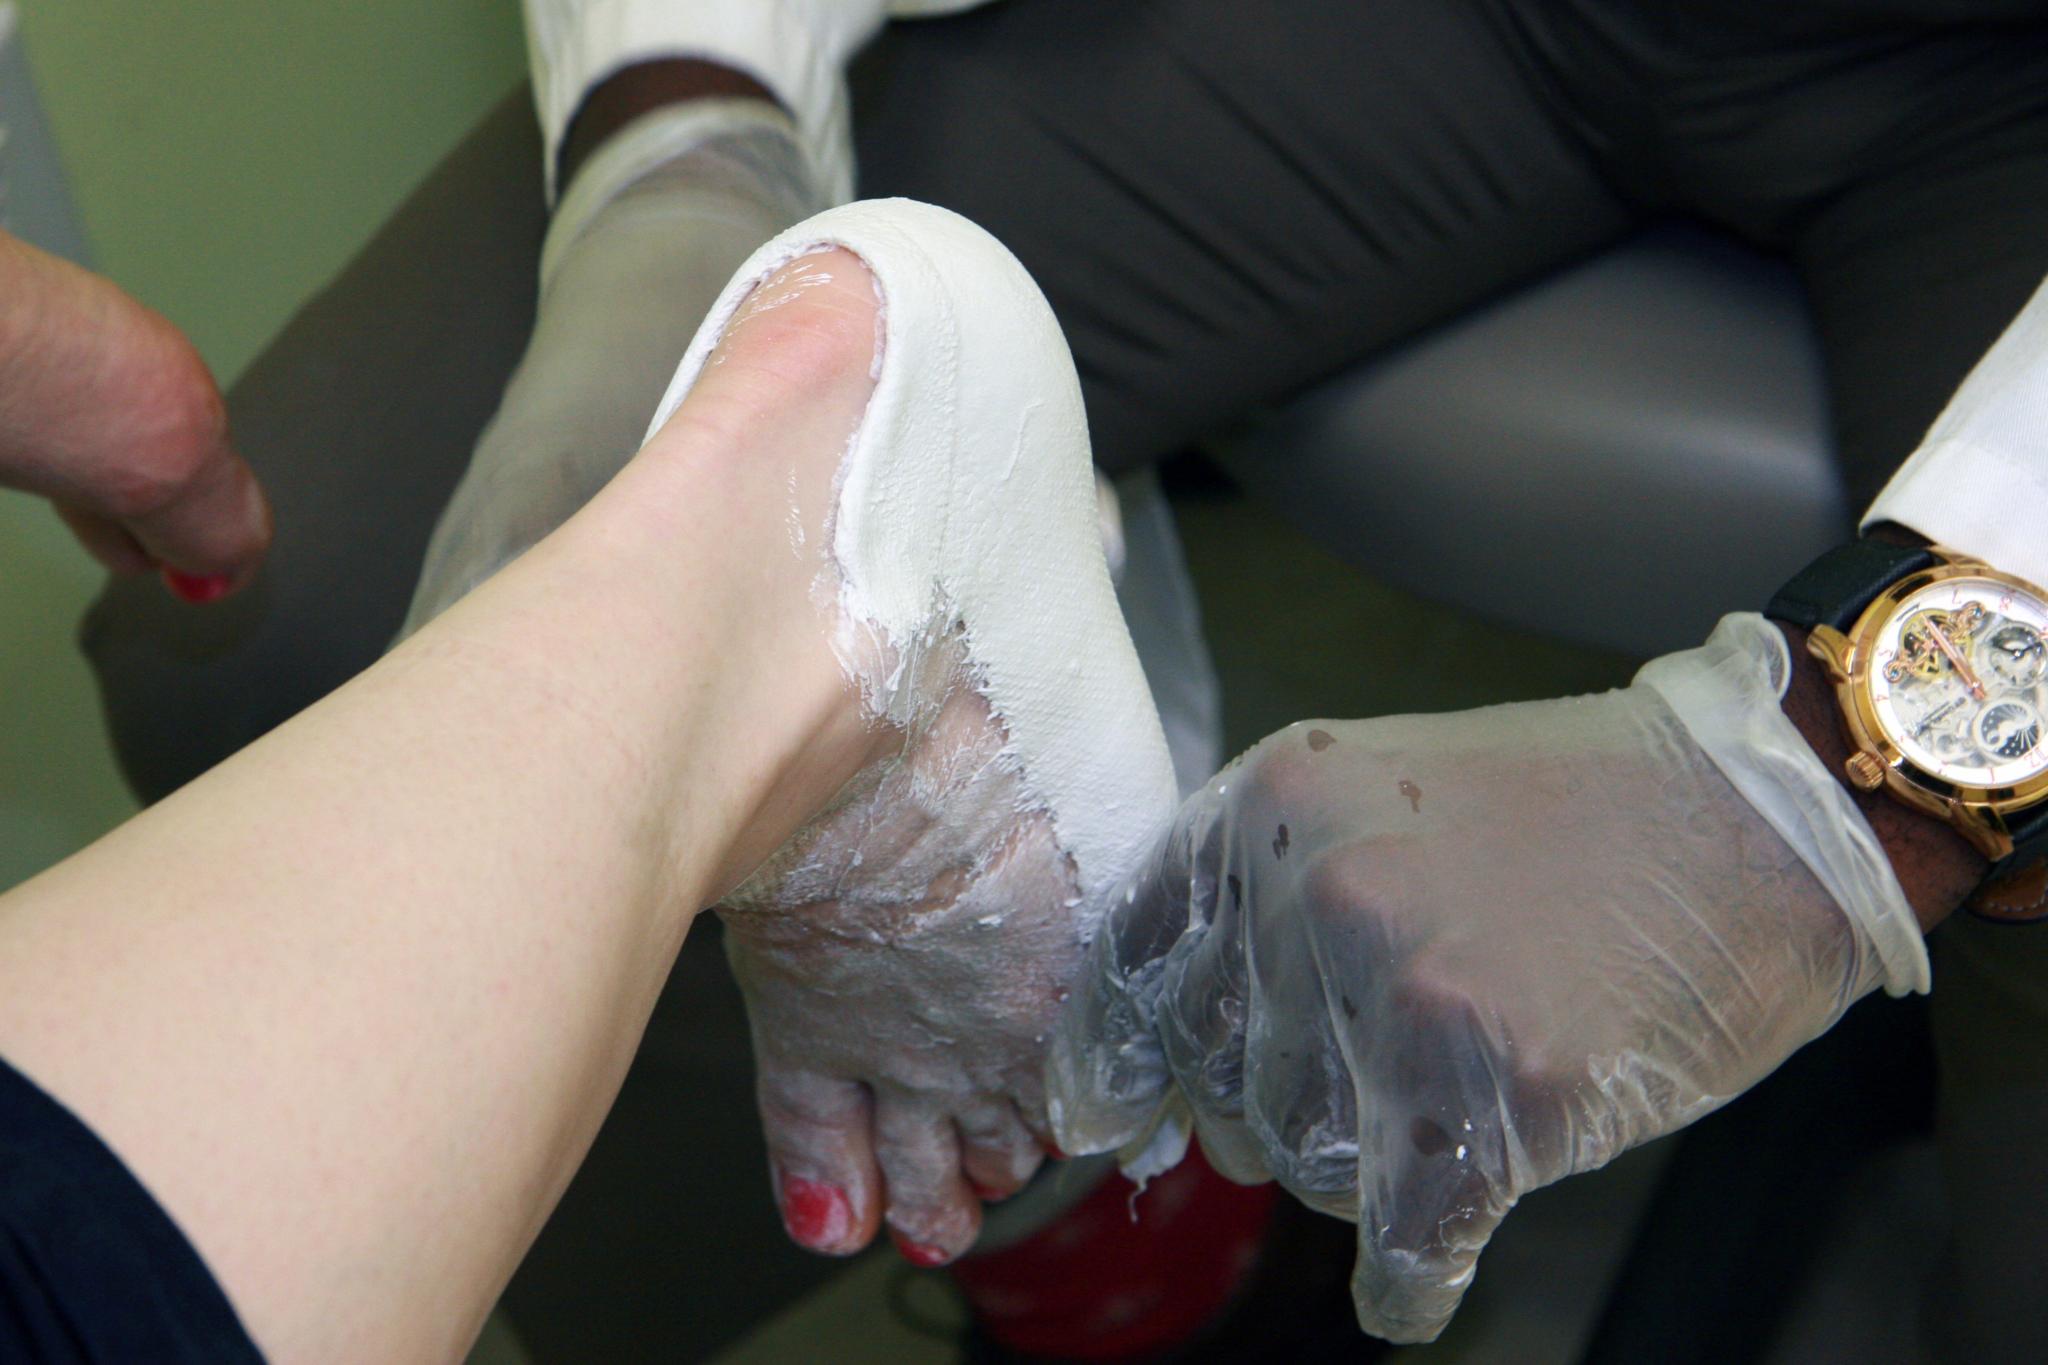 Gait Maxx Foot Care & Custom Orthotics Clinic Niagara Falls (905)358-5008